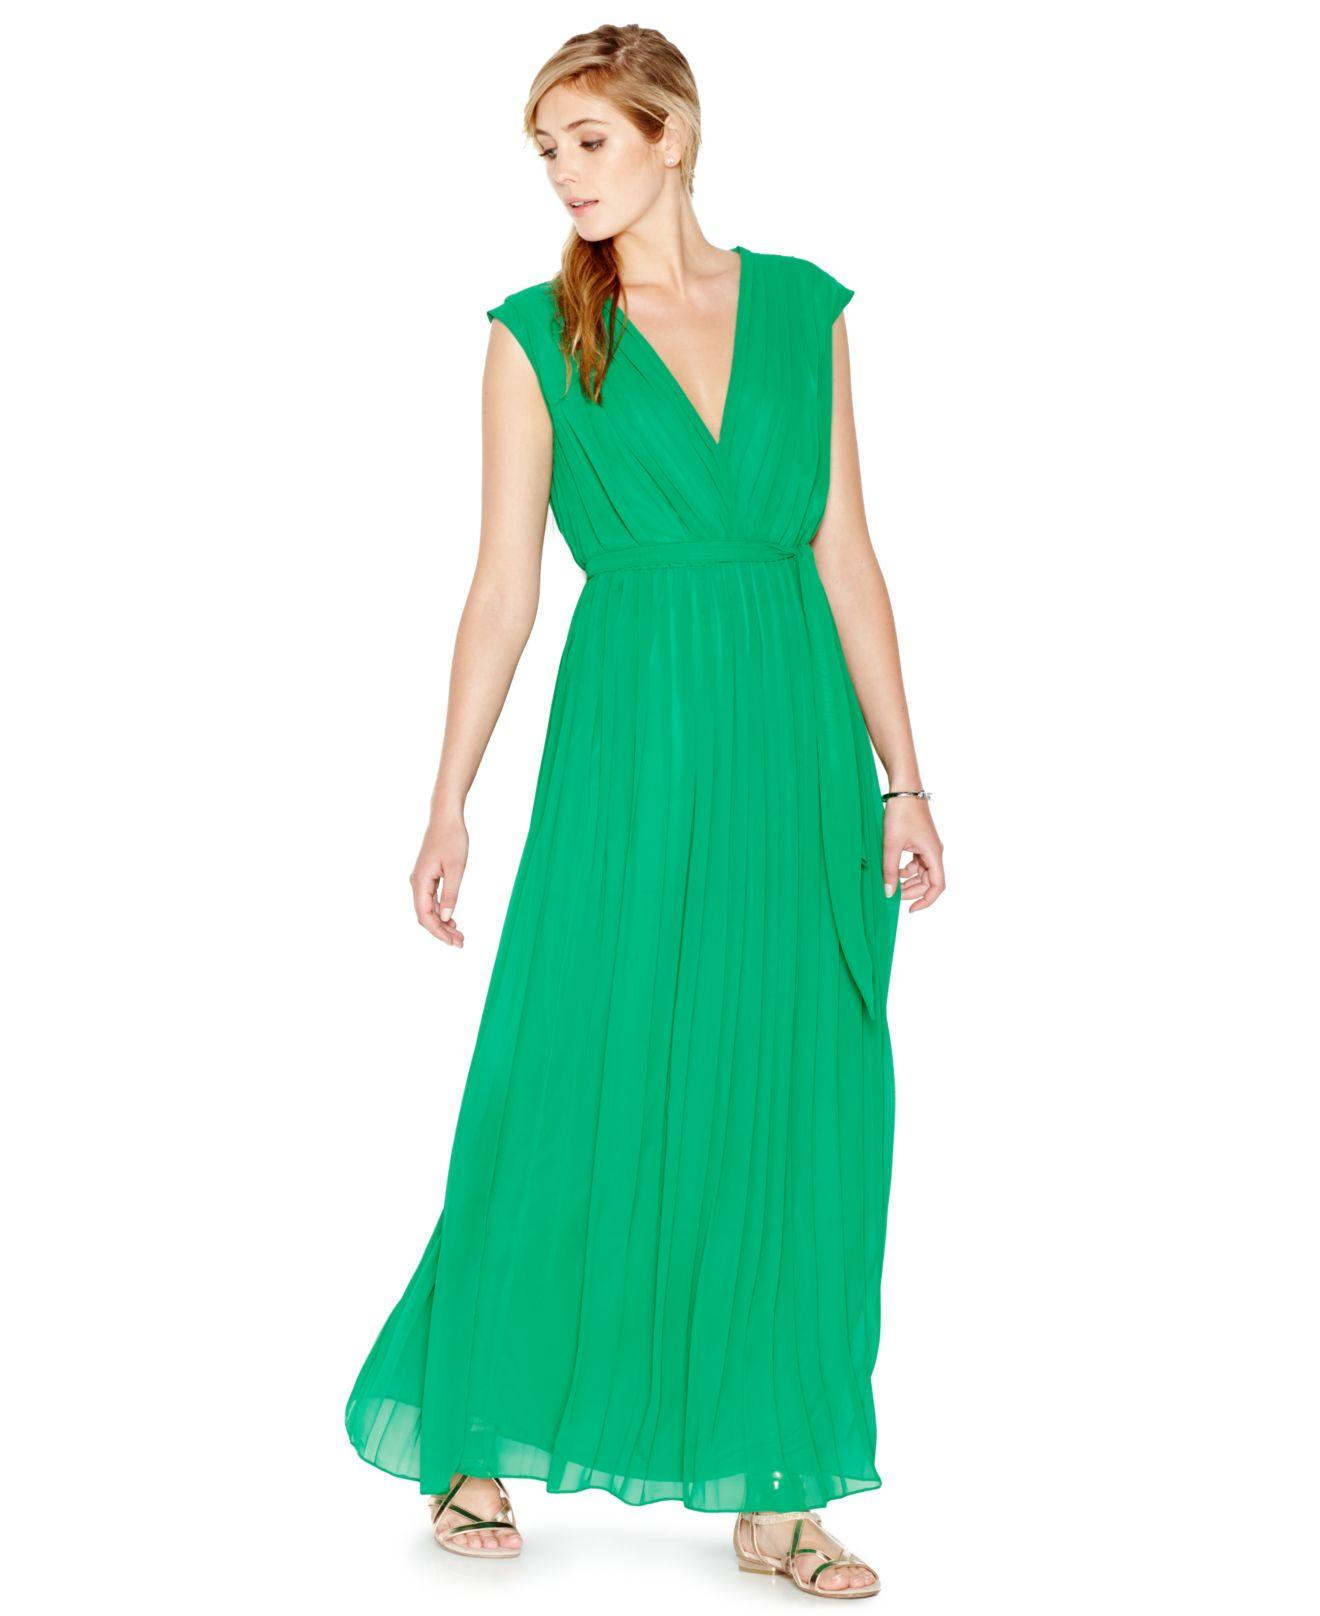 Jessica simpson maxi dresses sale